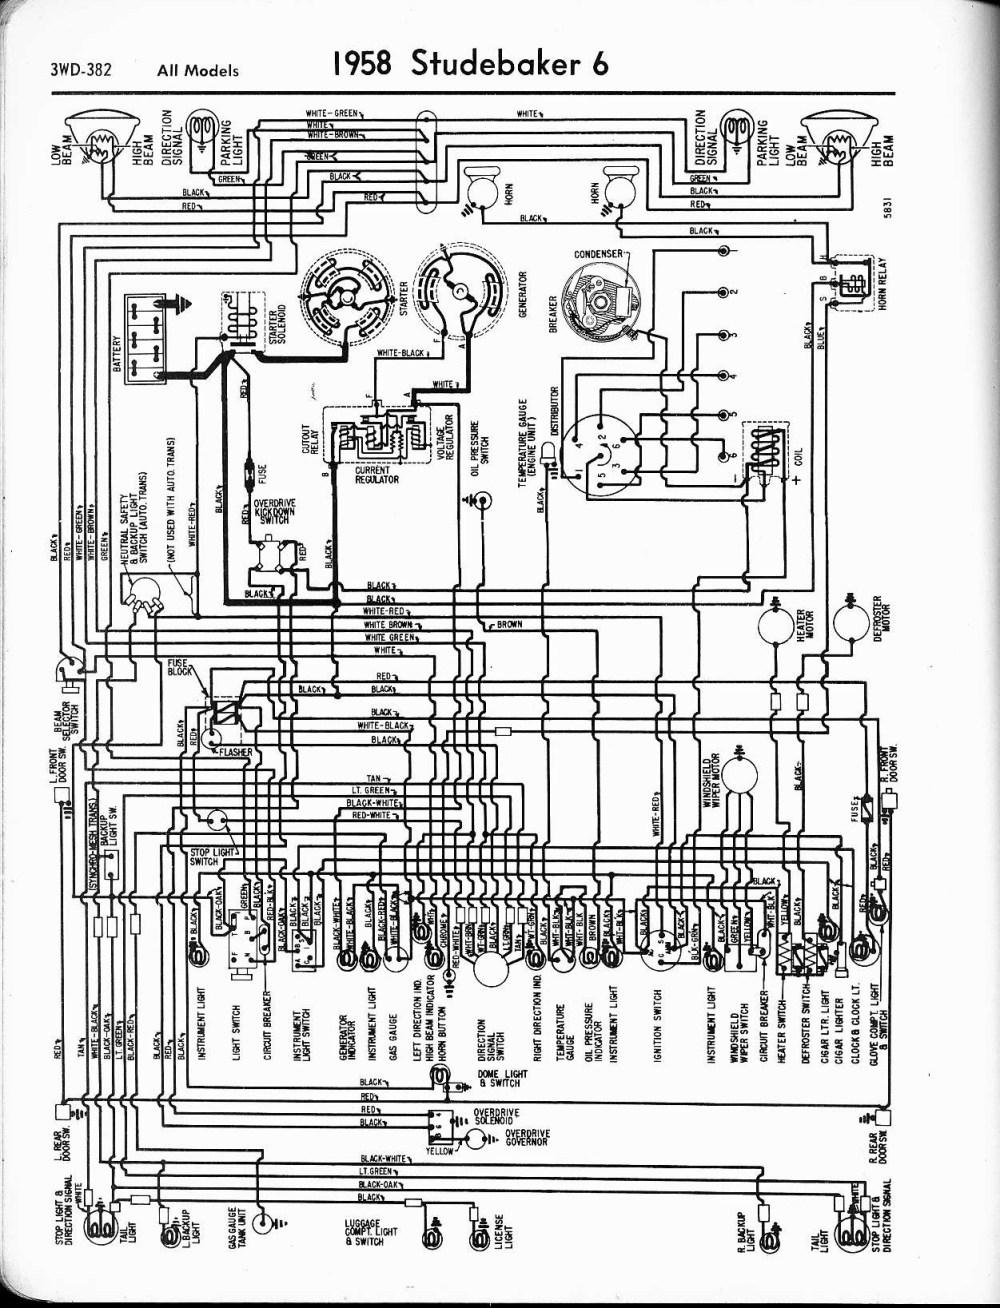 medium resolution of 1950 studebaker wiring diagram wiring diagram for you1950 studebaker champion wiring diagram wiring library 1950 studebaker